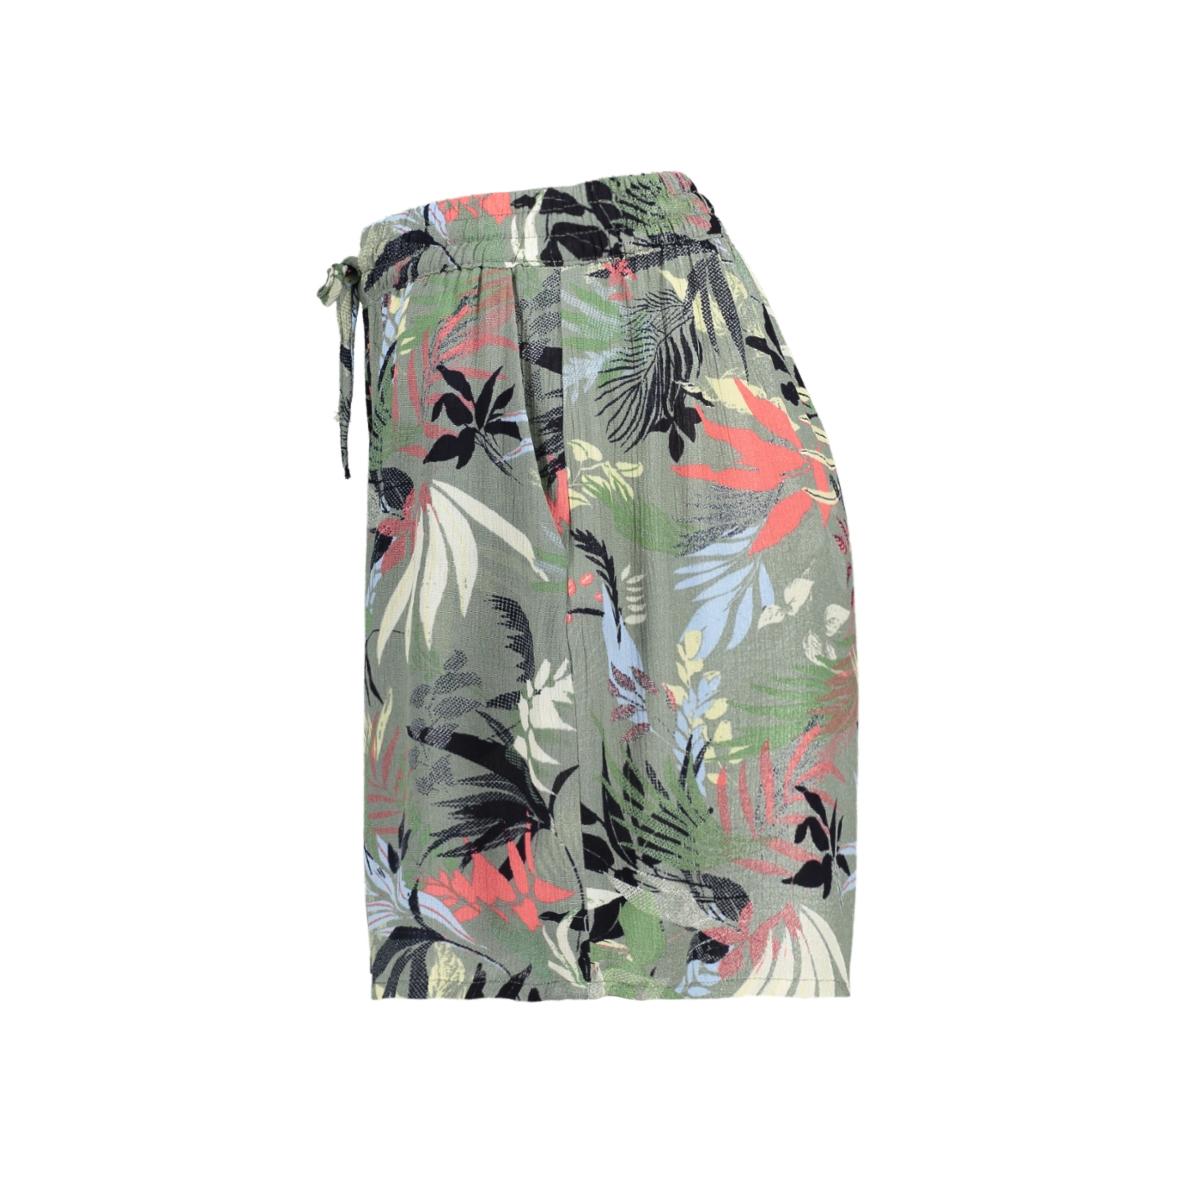 vmpheobe nw shorts wvn ga 10230648 vero moda korte broek laurel wreath/pheobe